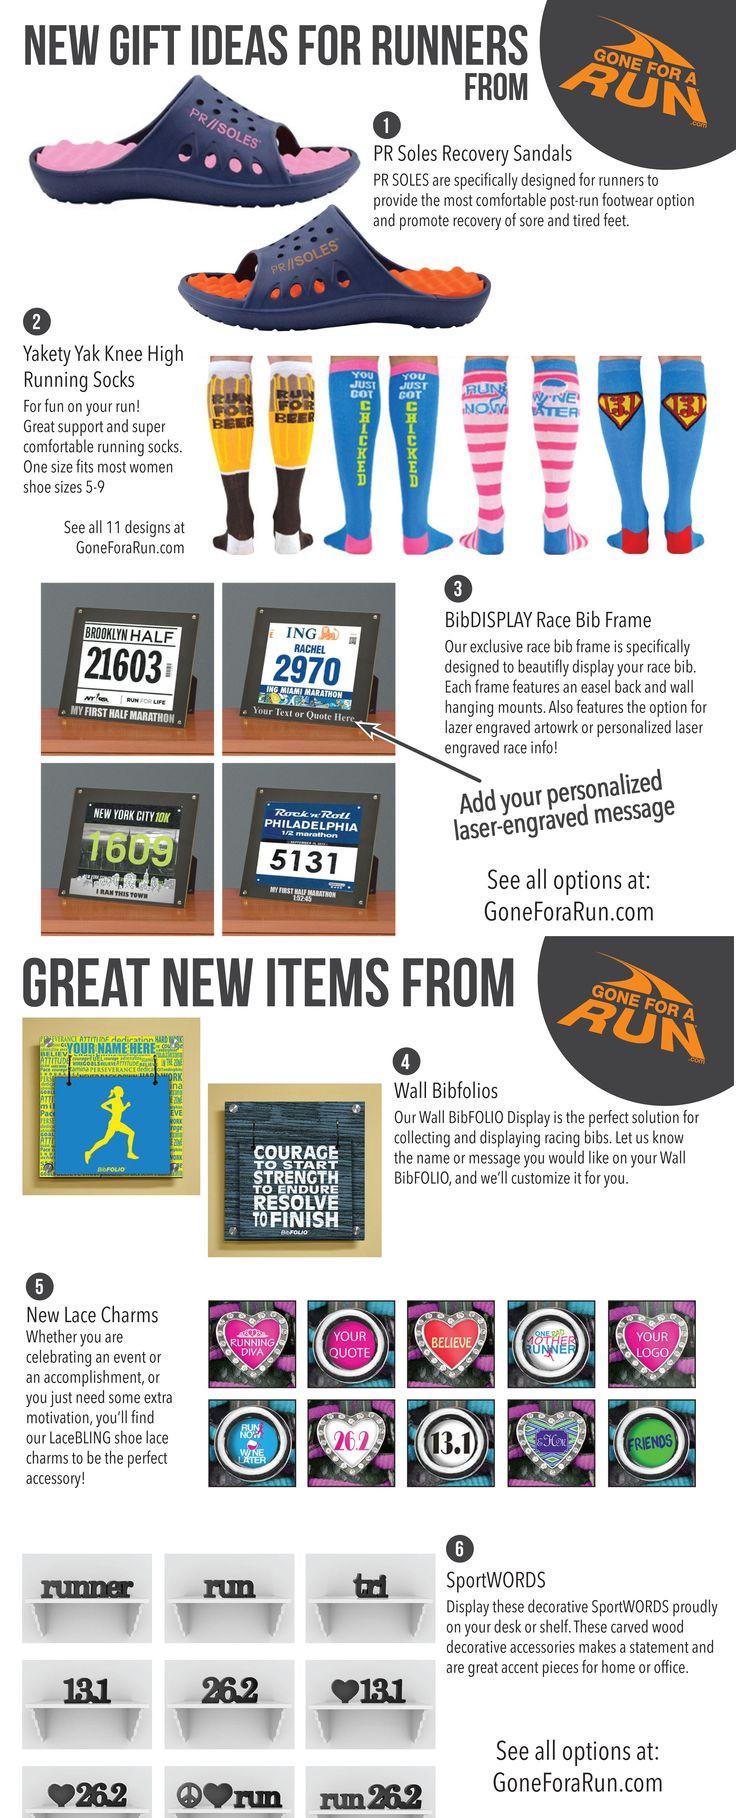 Best ideas about Gift Ideas For Marathon Runners . Save or Pin Best 25 Gifts for runners ideas on Pinterest Now.